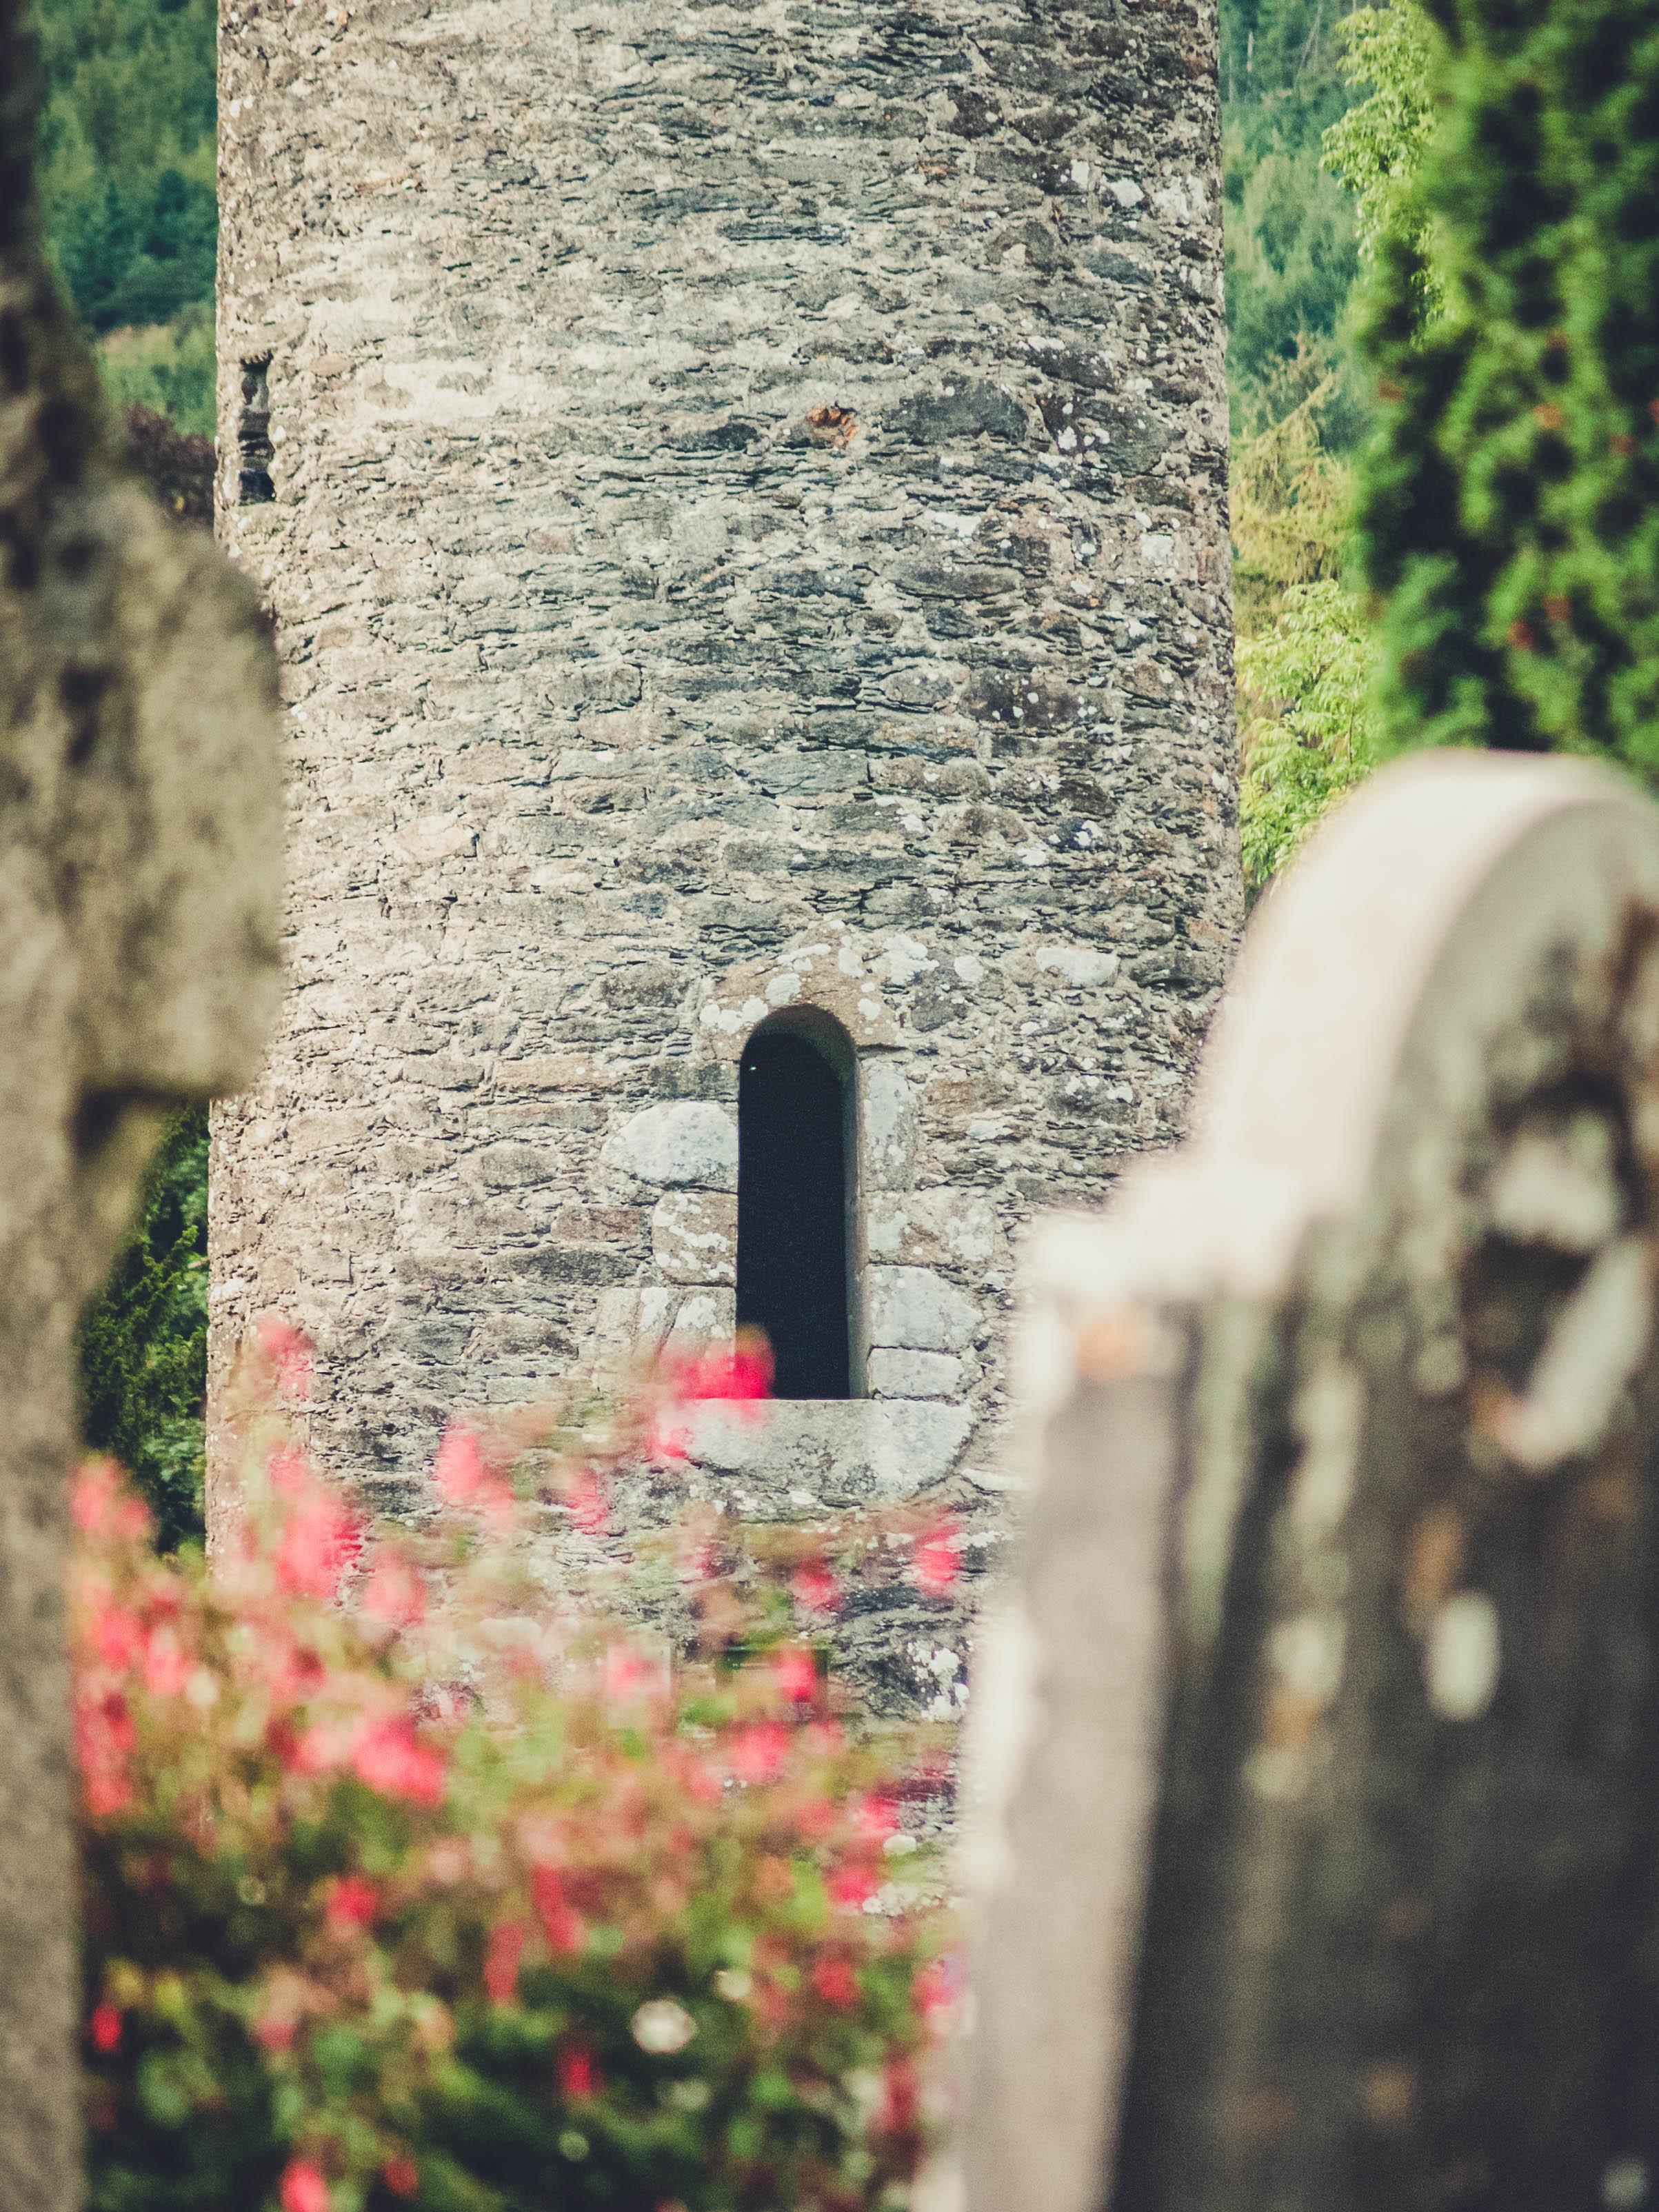 glendalough. irish history. county wicklow. round tower. hill walknig. hiking. grave yard. wildlife. tombstones. lakes. blue sky. little hole.jpg